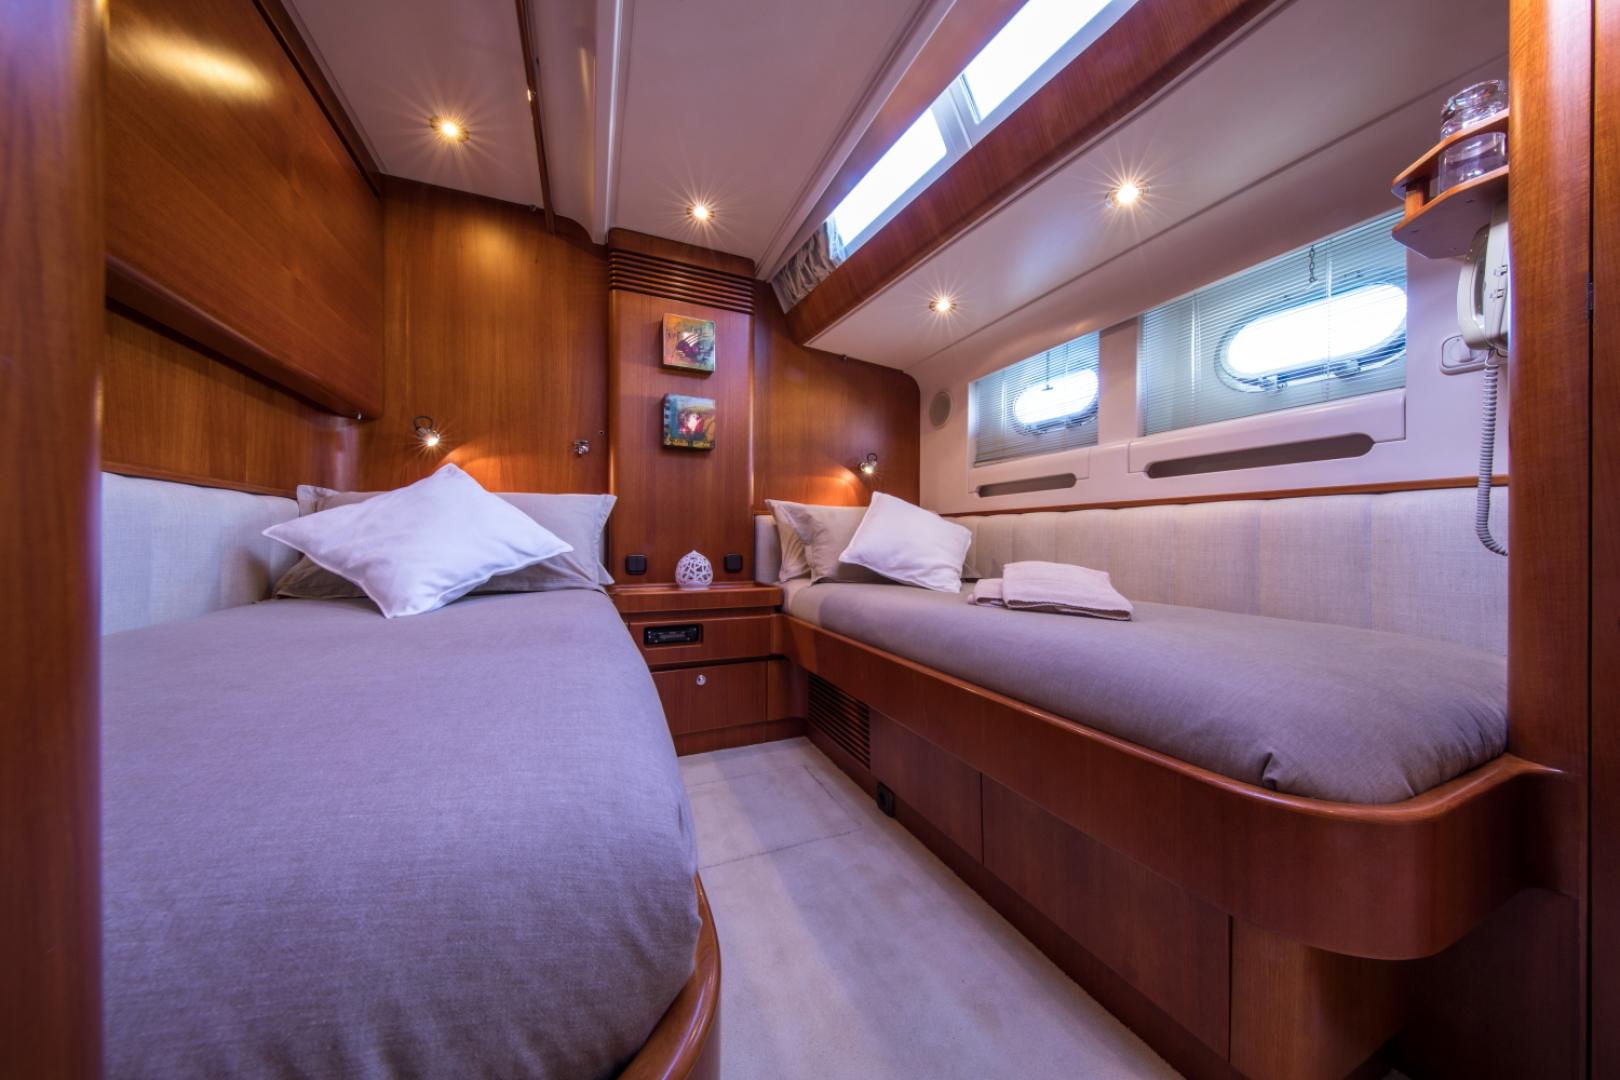 Jongert-2900M 1991-ALTA MAREA Palma de Mallorca-Spain-Guest Cabin 2-1117270   Thumbnail